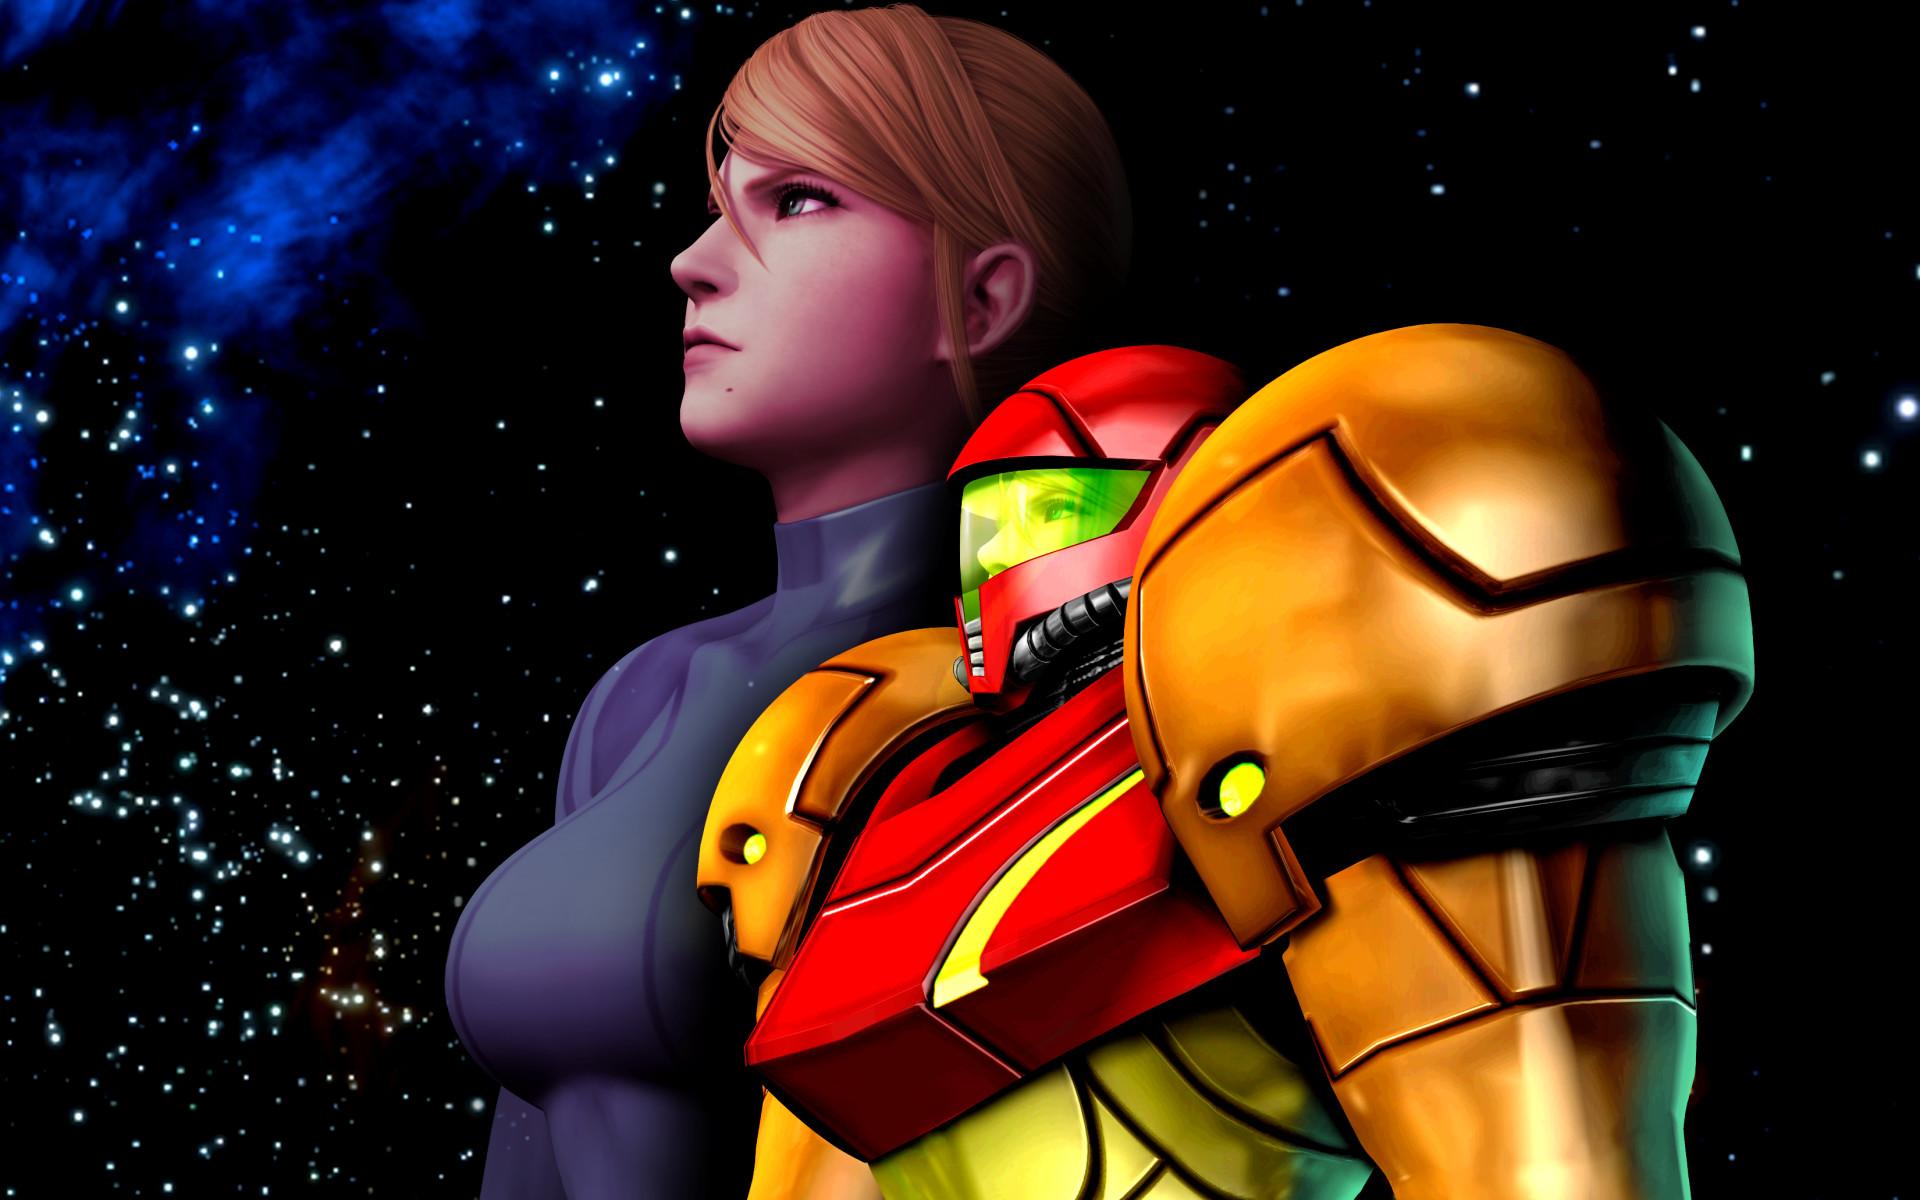 Metroid Samus Aran Zero Suit Samus wallpaper